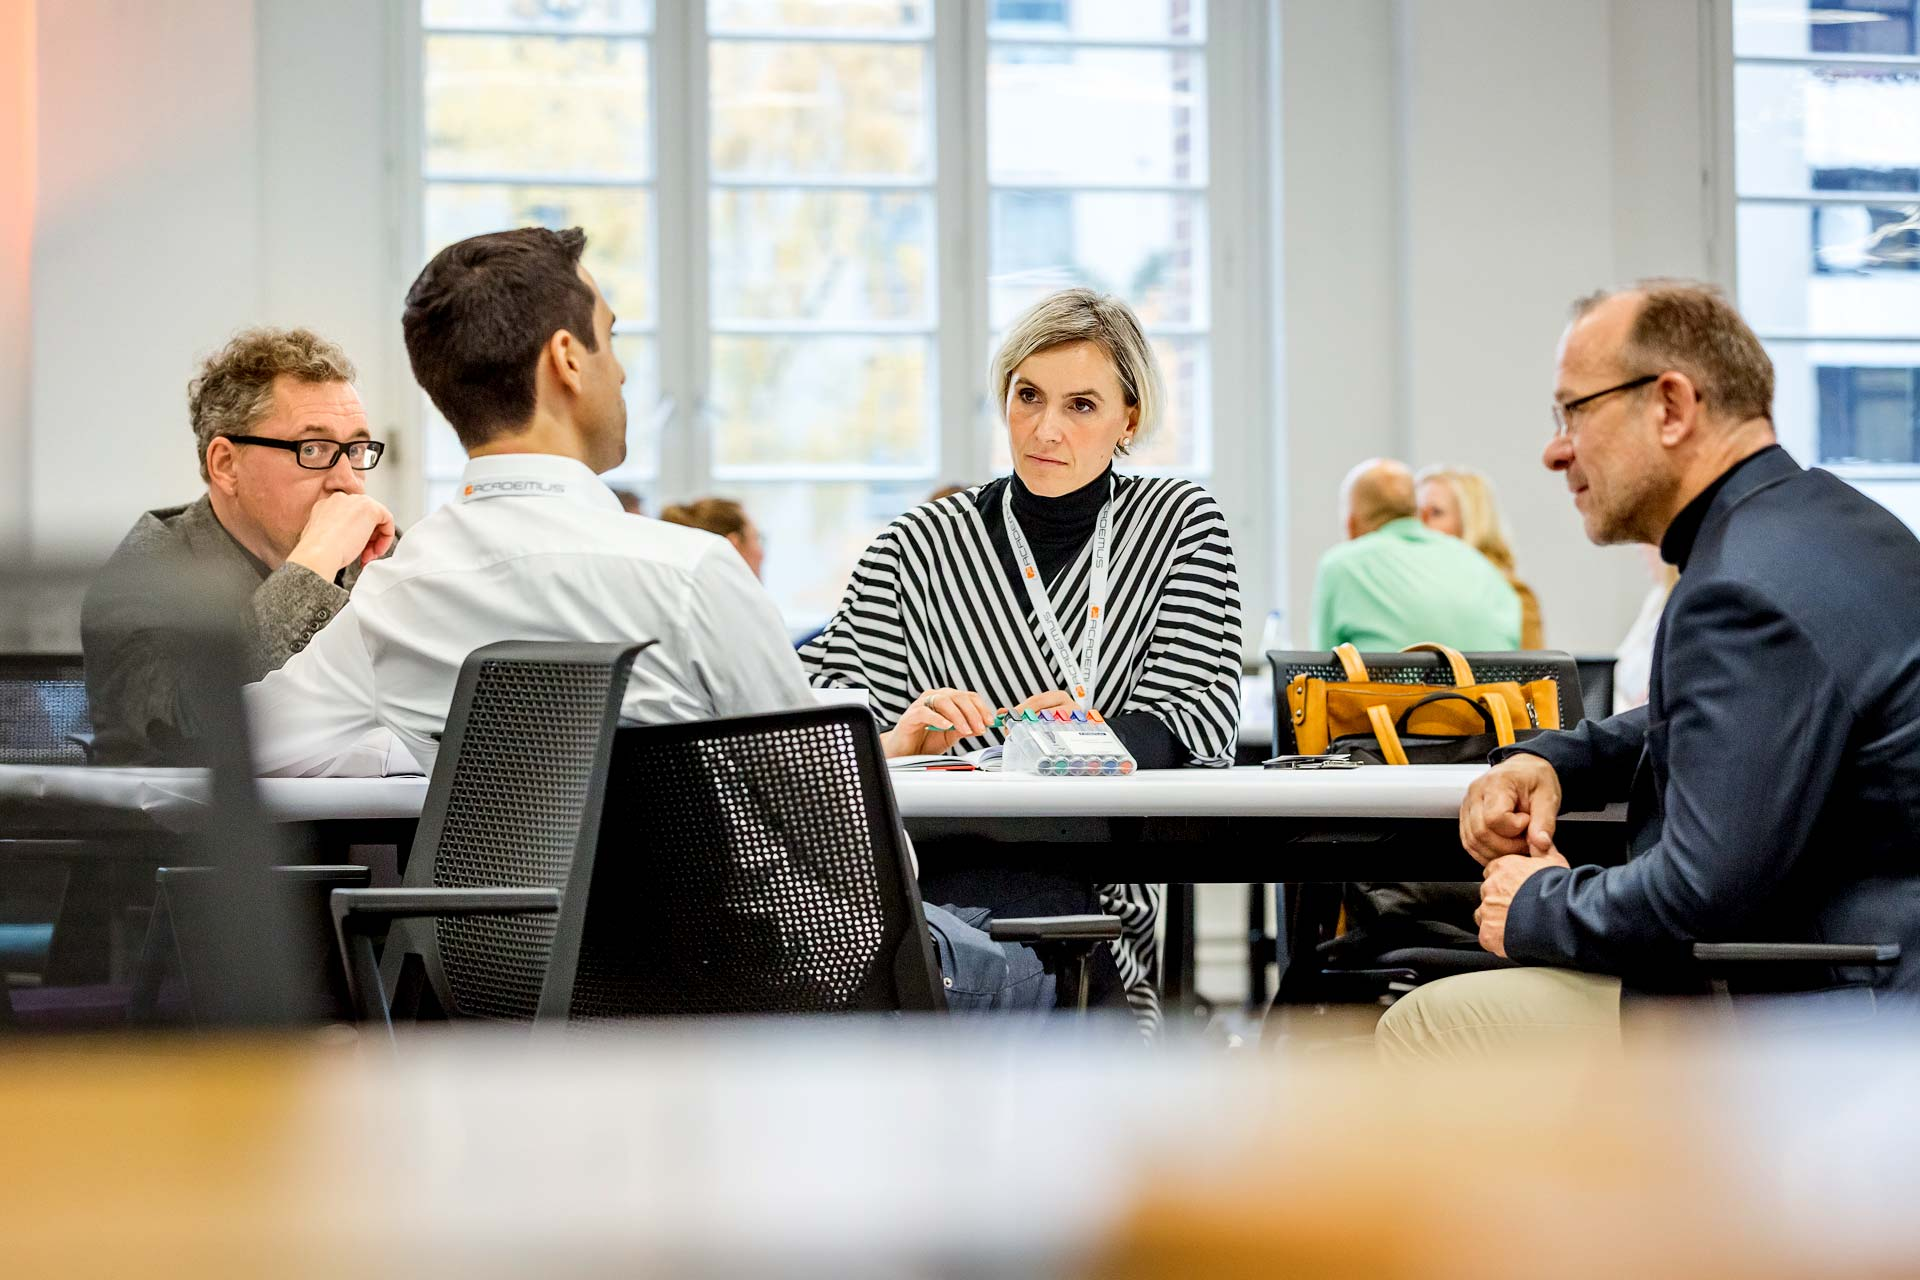 eventfotograf-workshop-dialogue-sessions-mobilitaetbranche